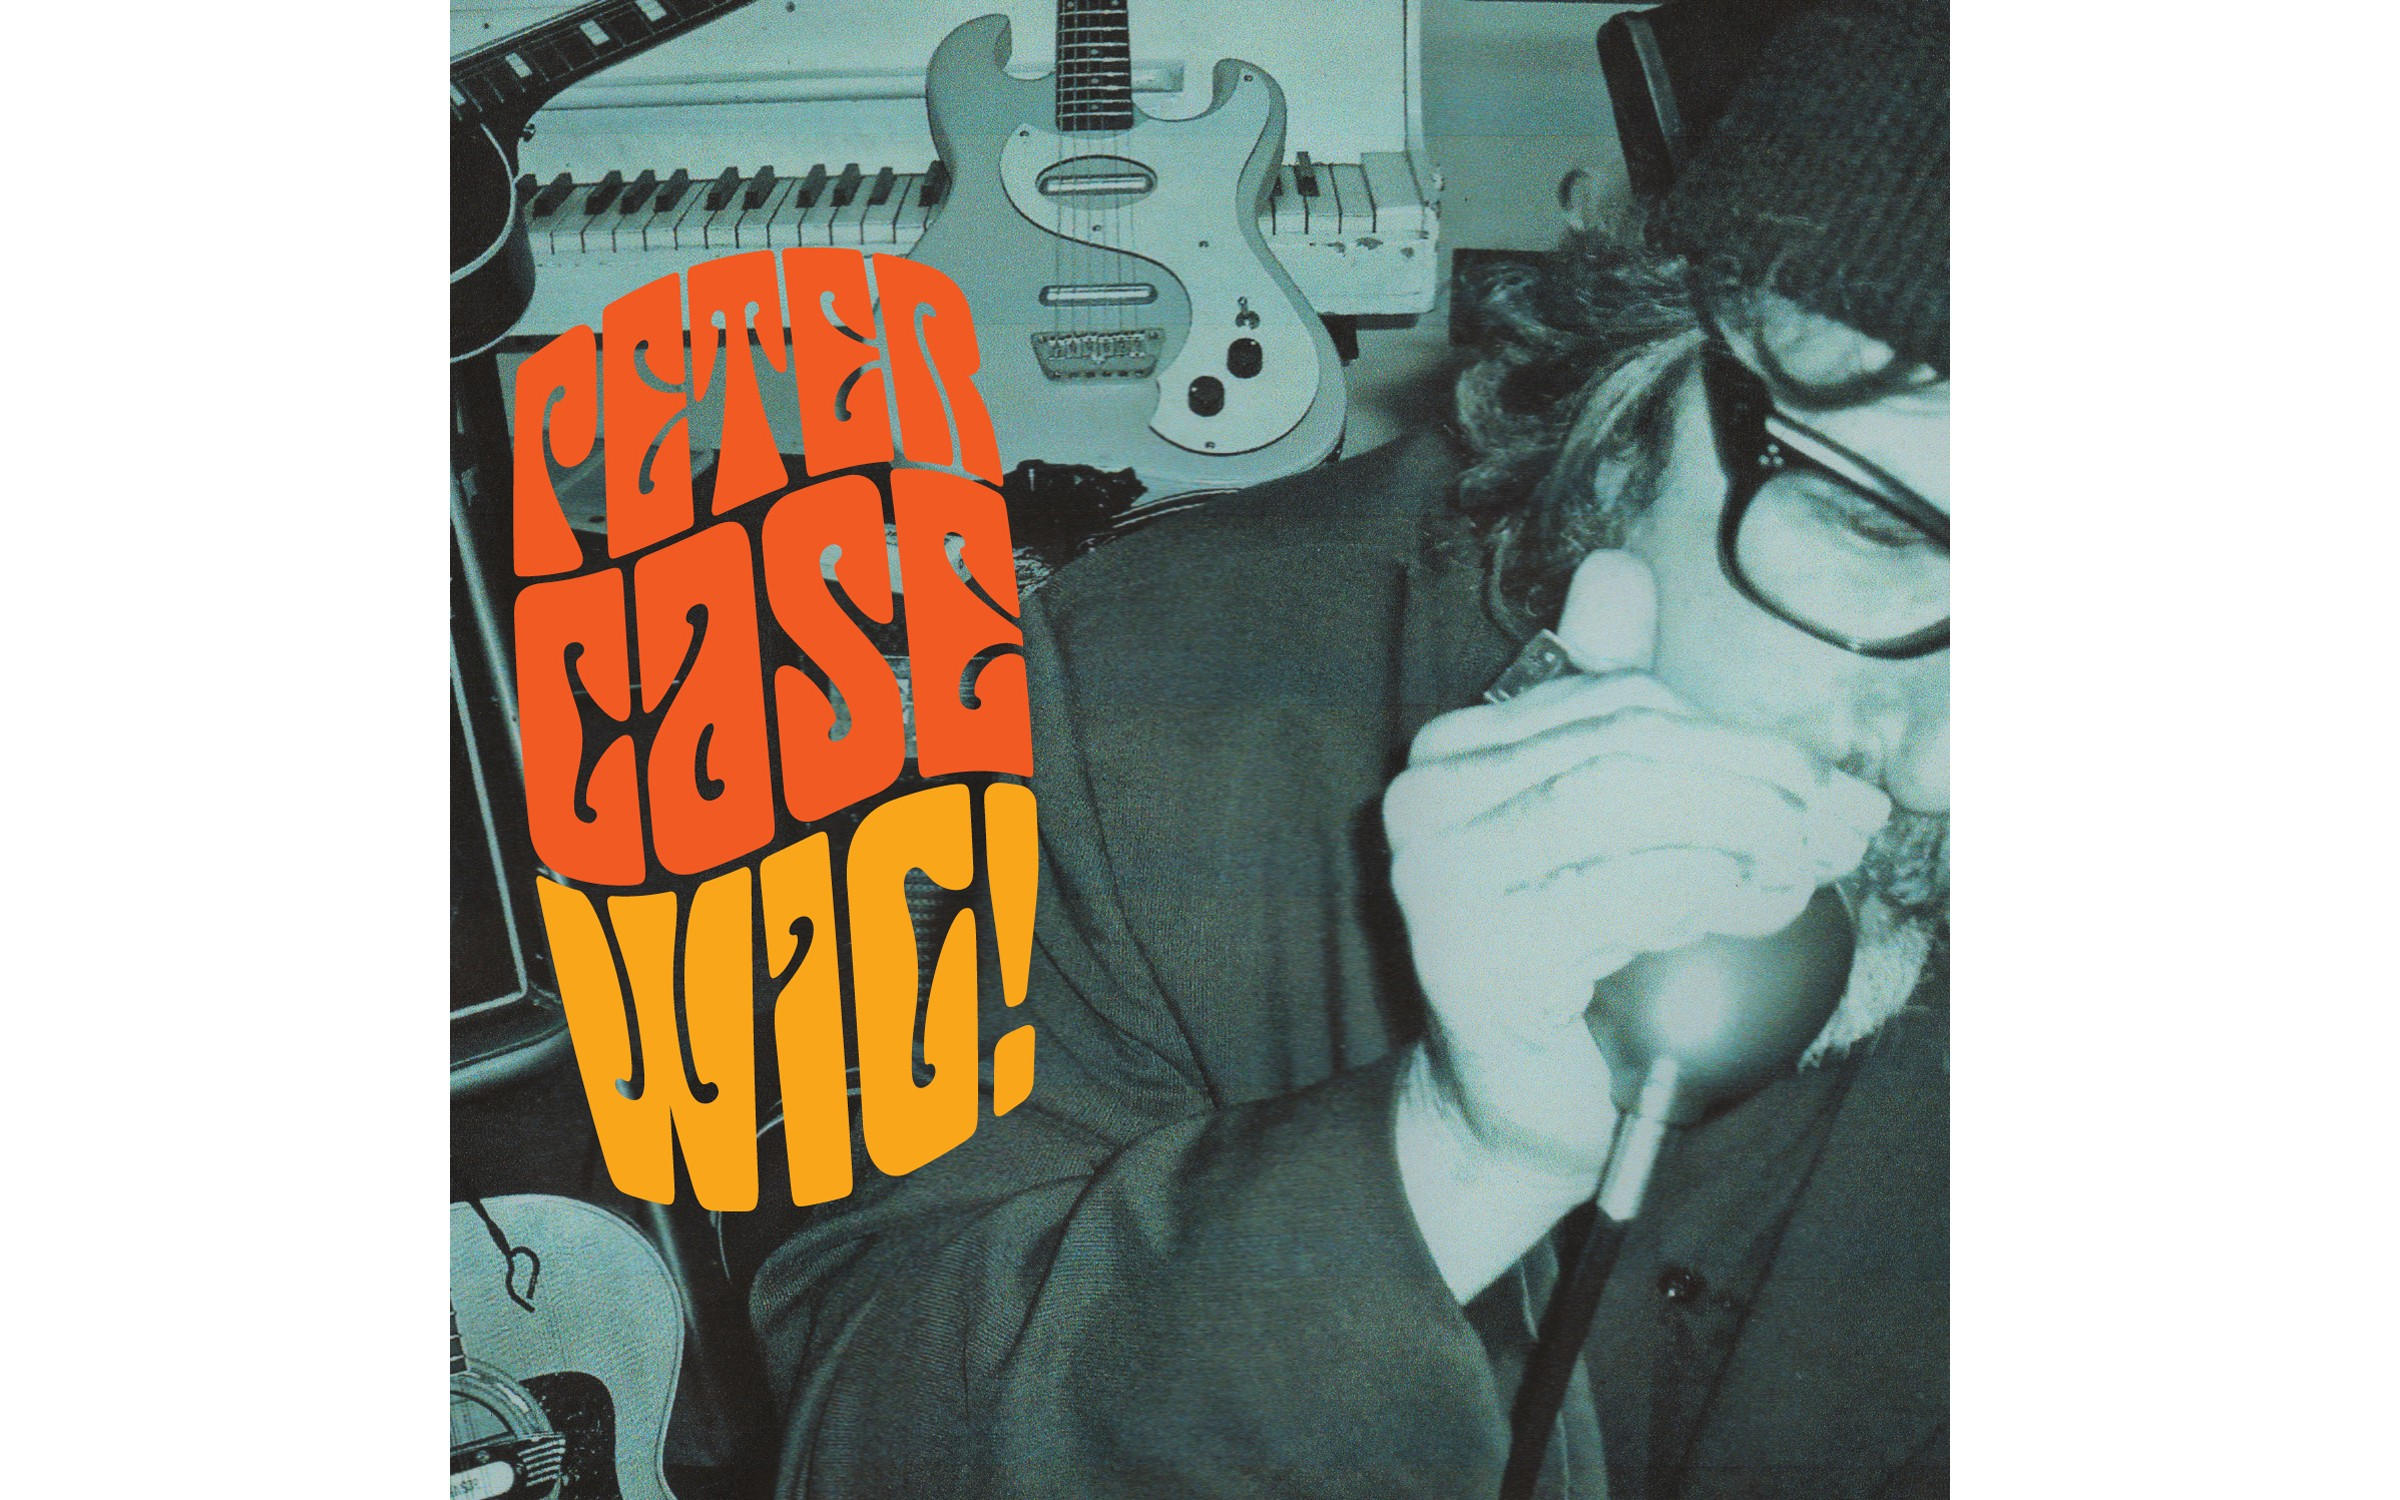 Wig! - BY PETER CASE - YEP ROC